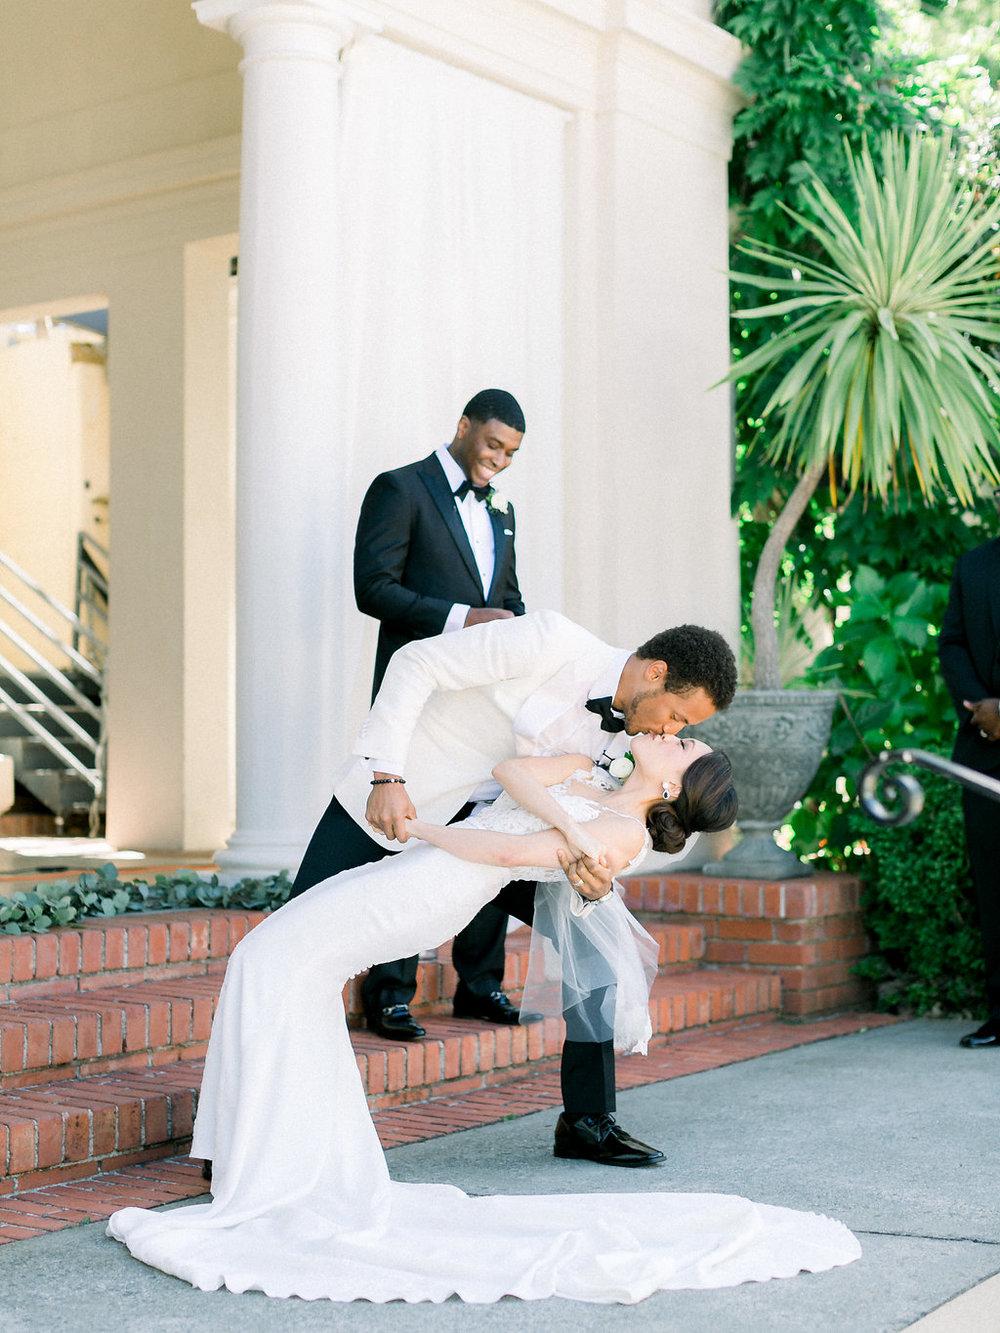 Film+Destination+Wedding+California+Fine+Art+Photographer+Jenny+Soi+-+All+White+Wedding+at+Villa+Montalvo+Saratoga,+CA (4).jpg